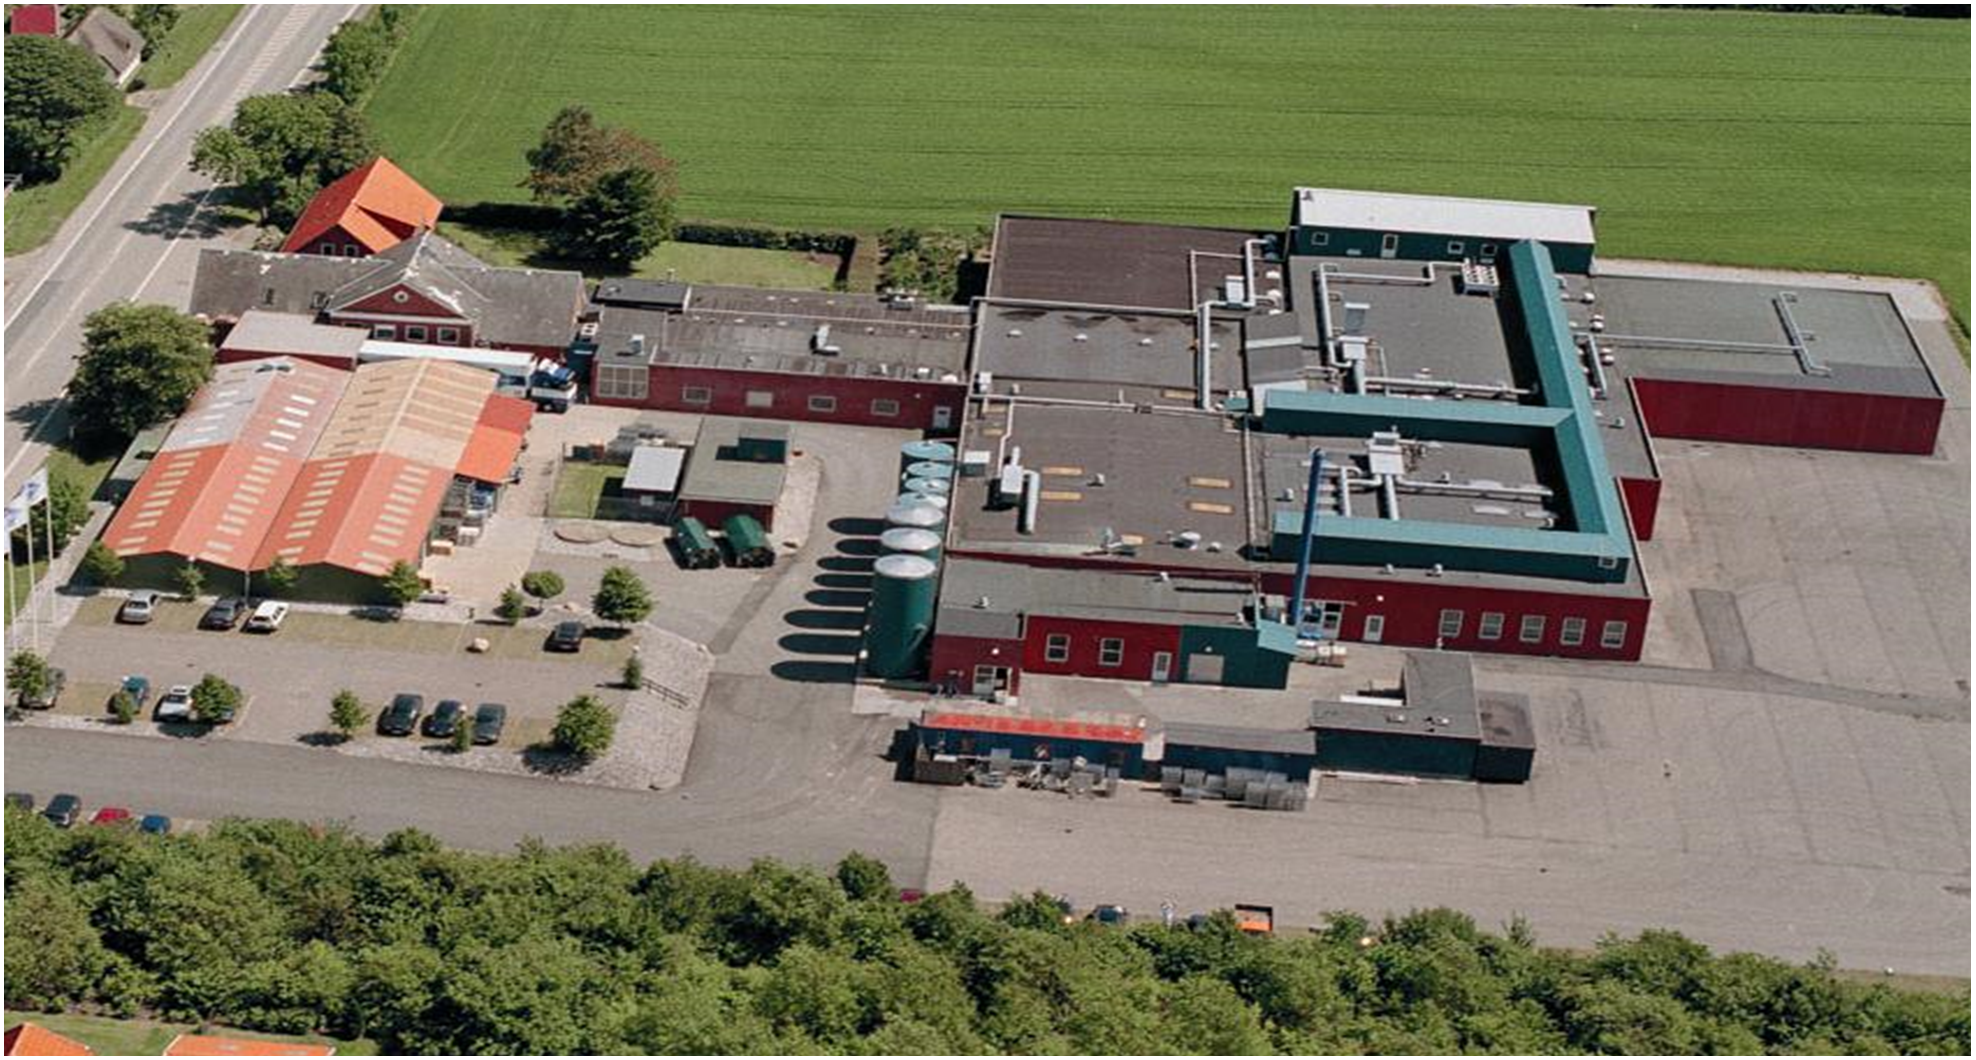 Lillebælt Dairy to close in 2019